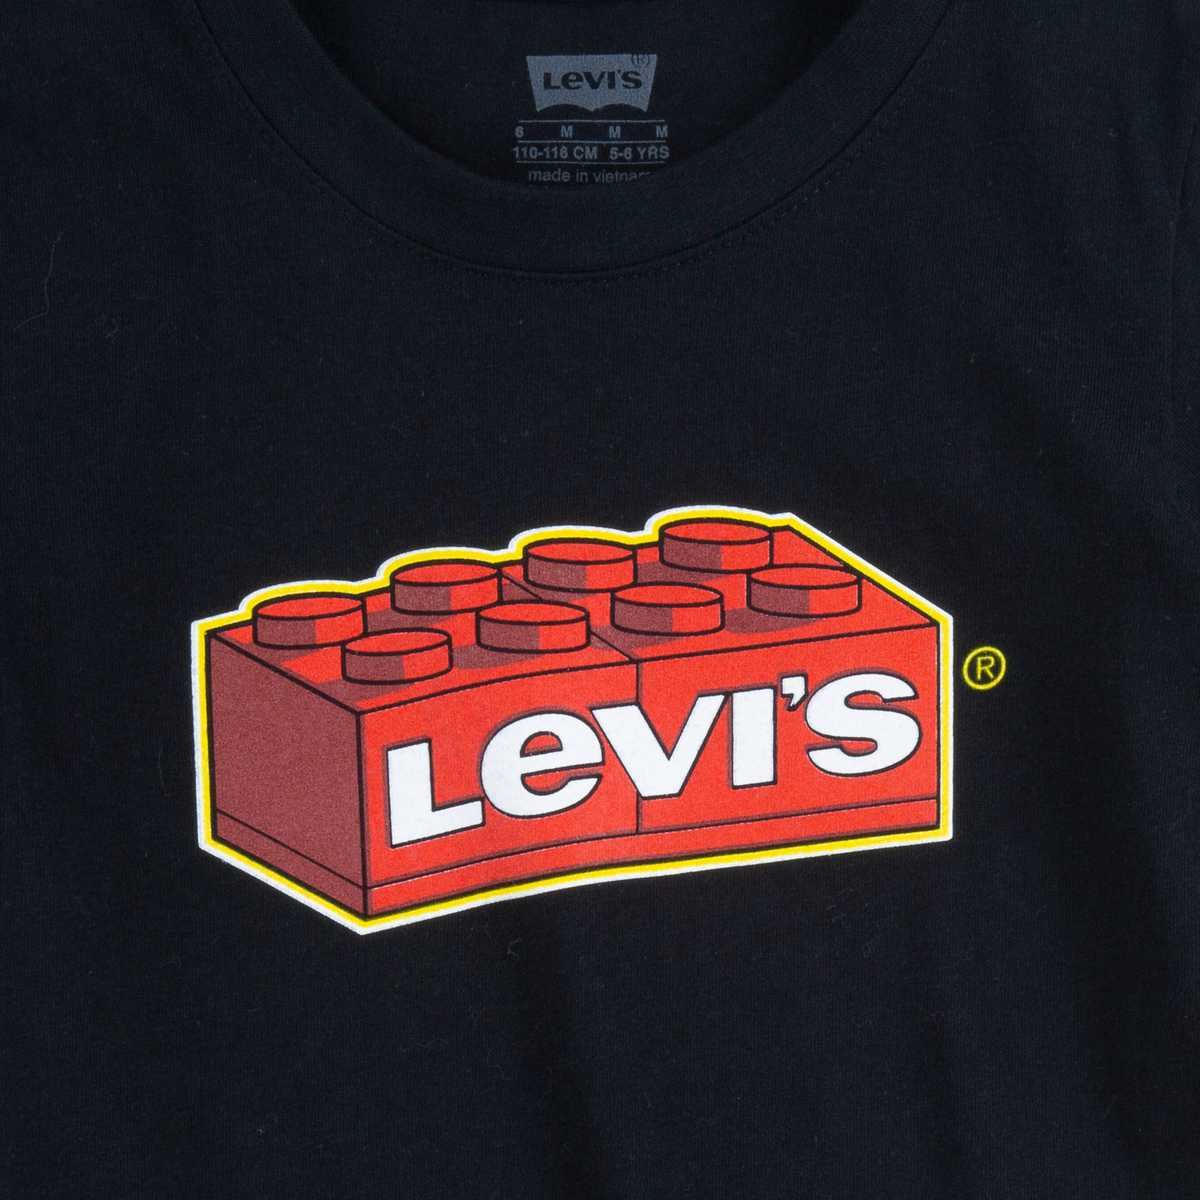 levis x lego 5006413 logo t shirt 4 7